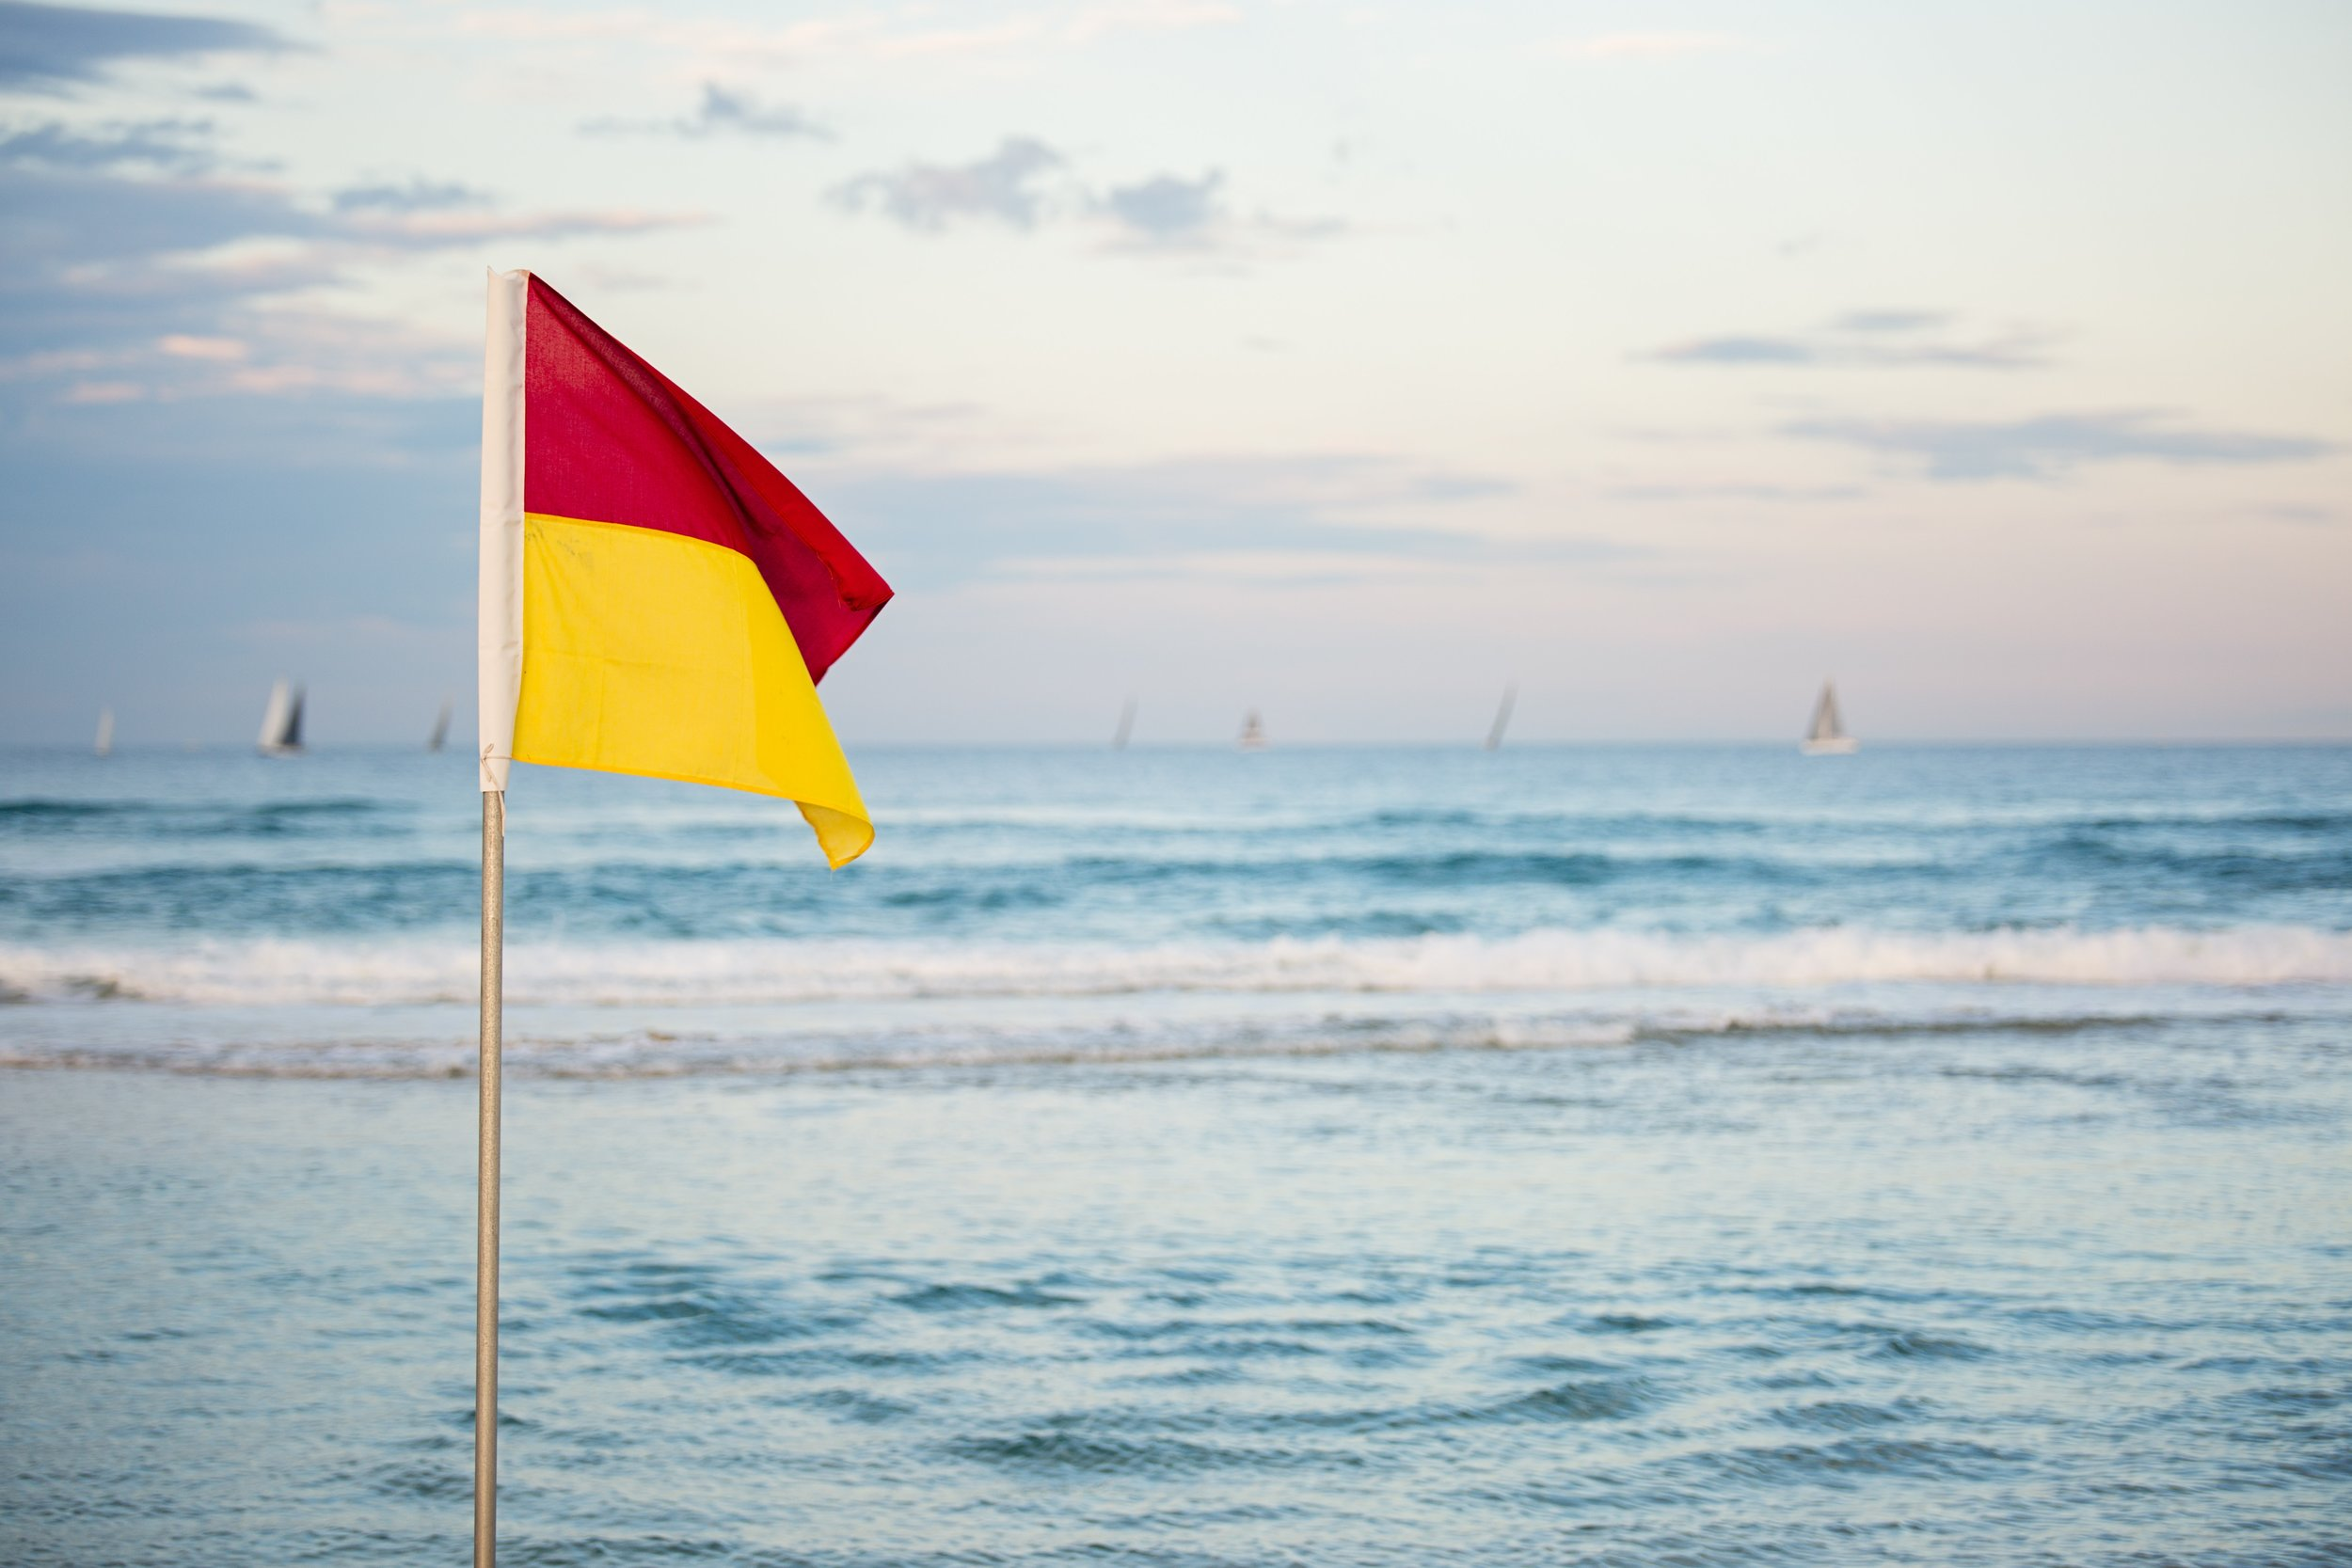 australia-beach-flag-1199182.jpg